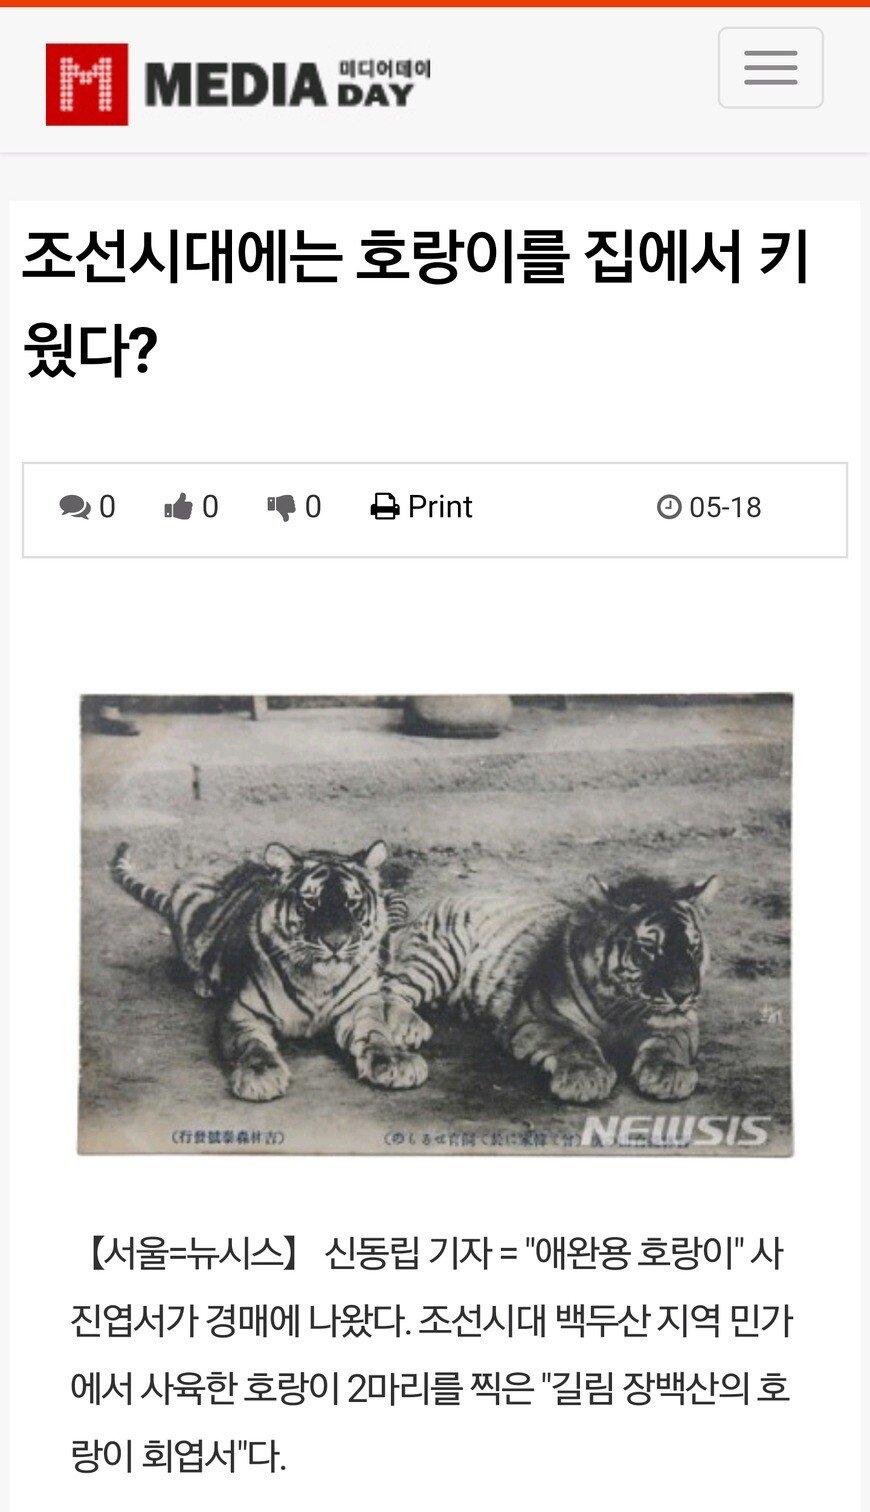 thumb_crop_resize.jpg 조선시대 반려동물 클라스.jpg